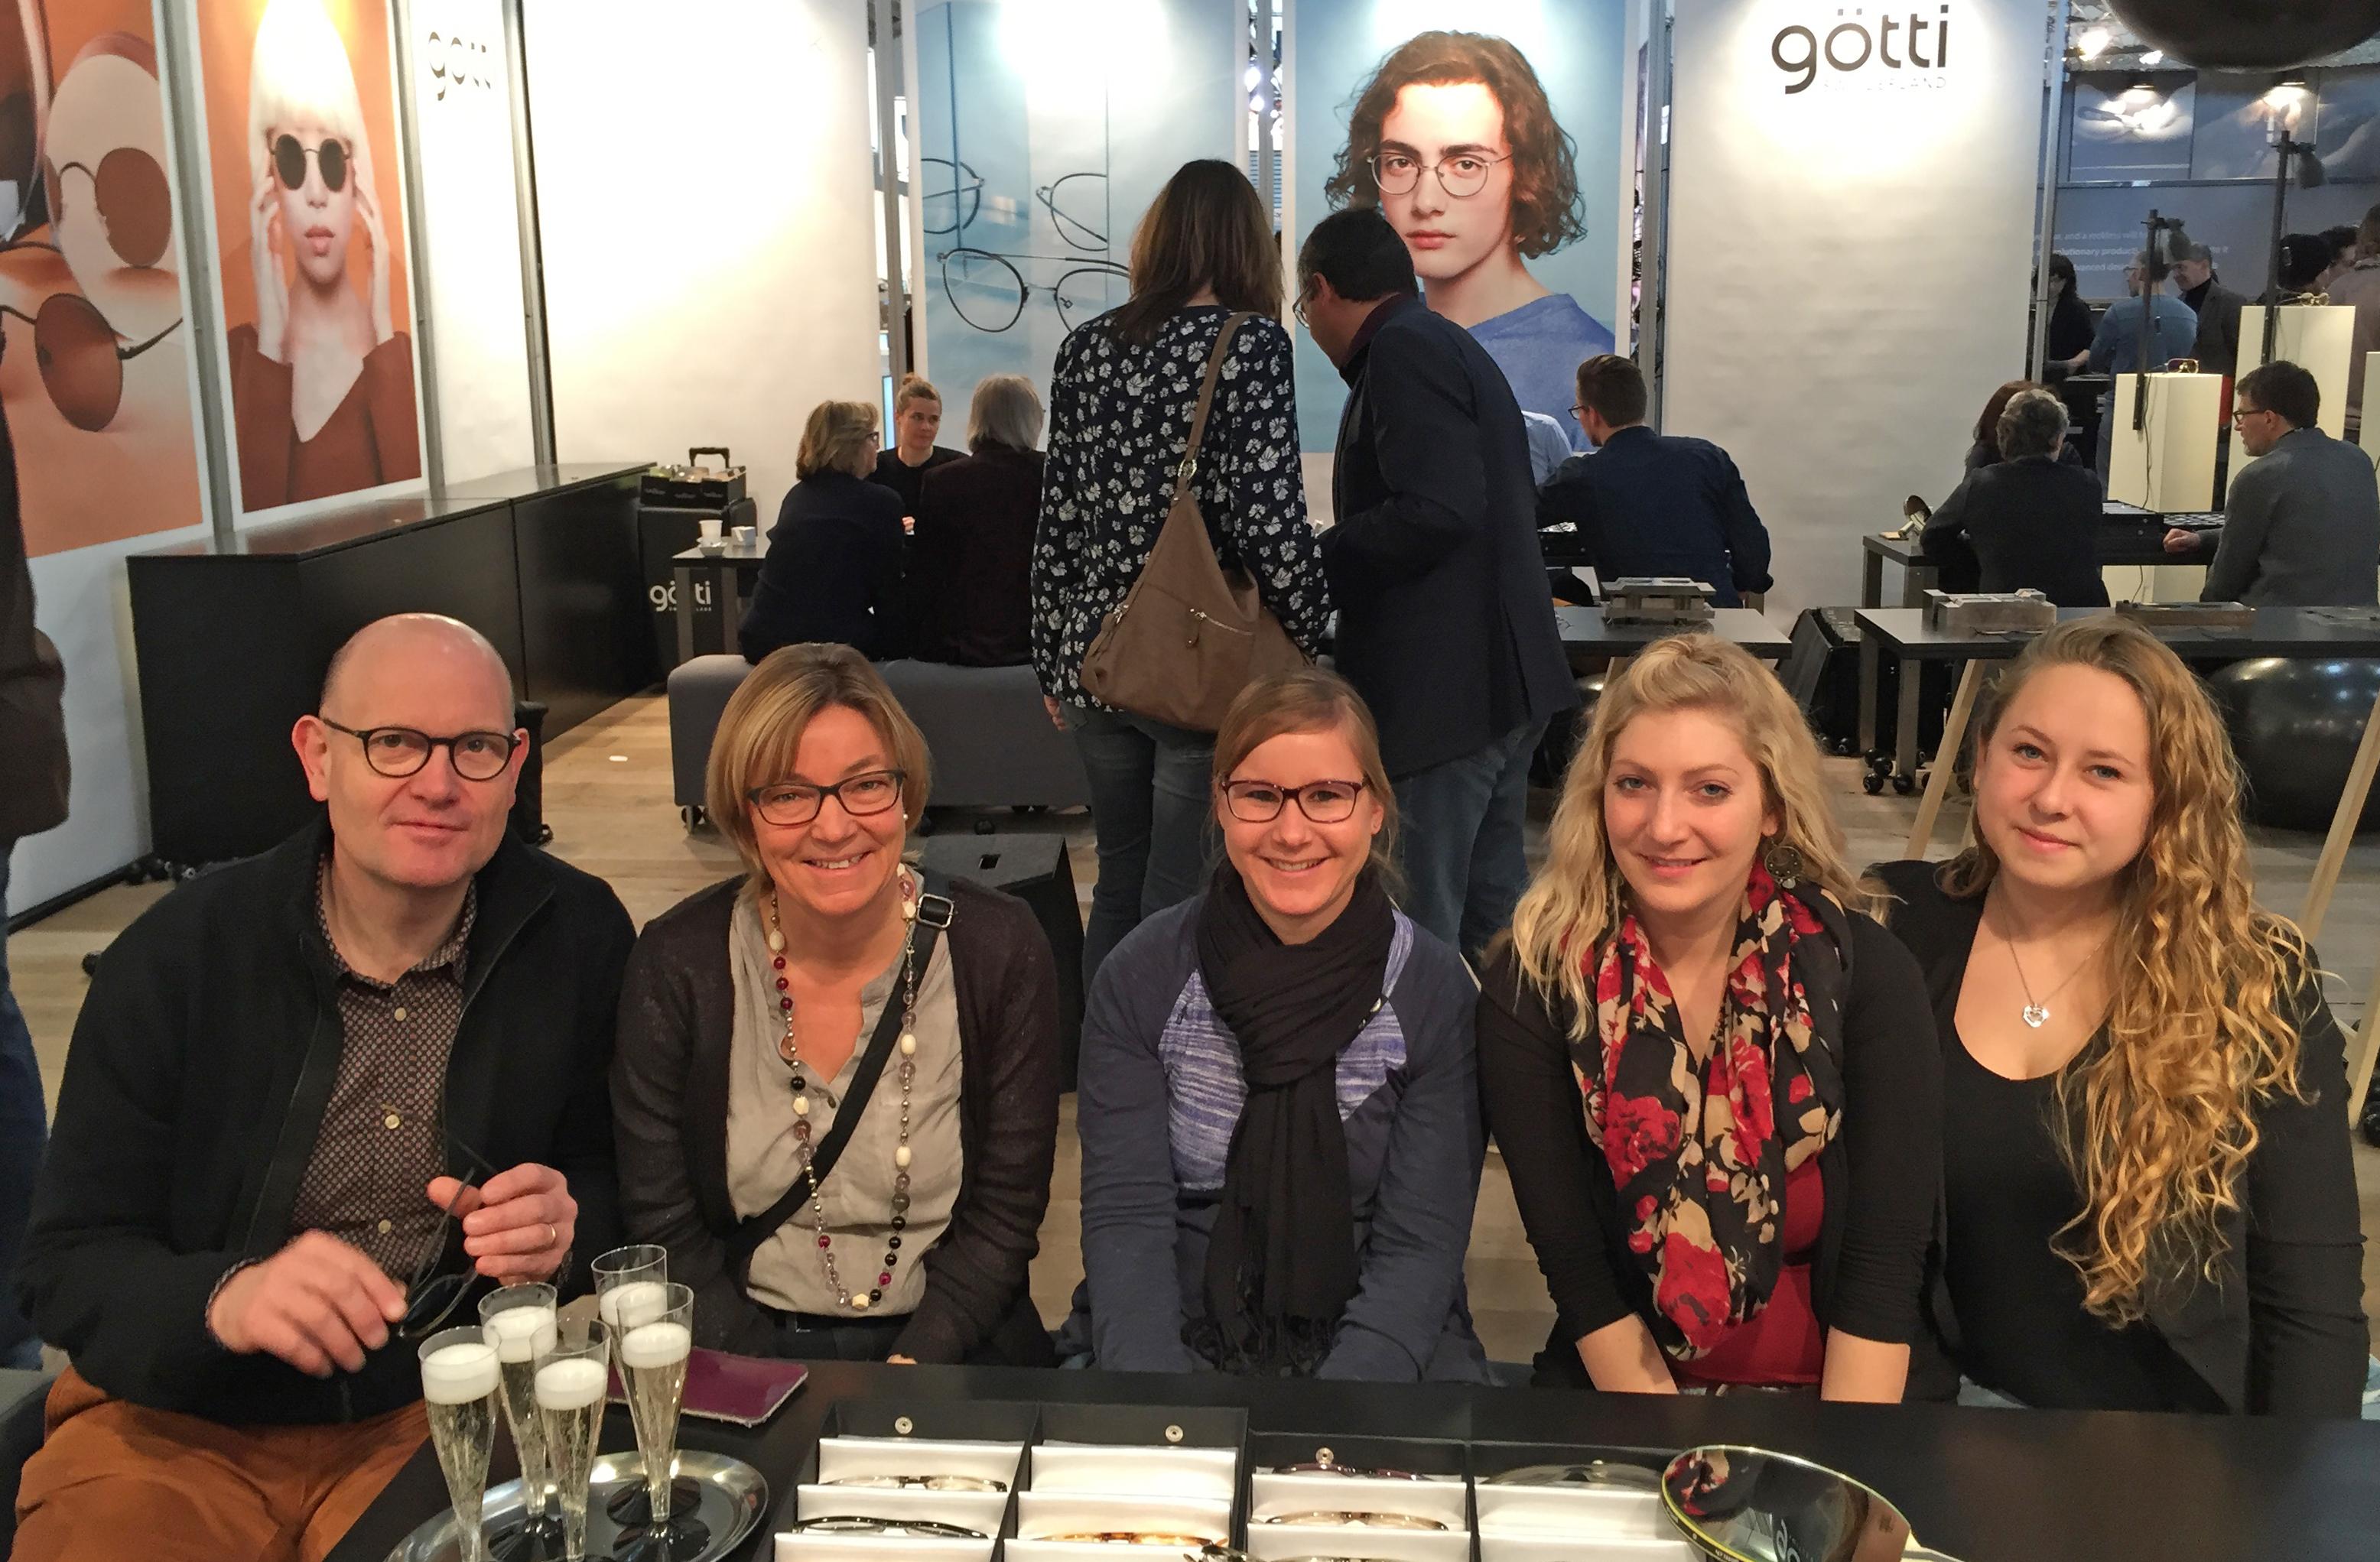 2016 Messe Opti München